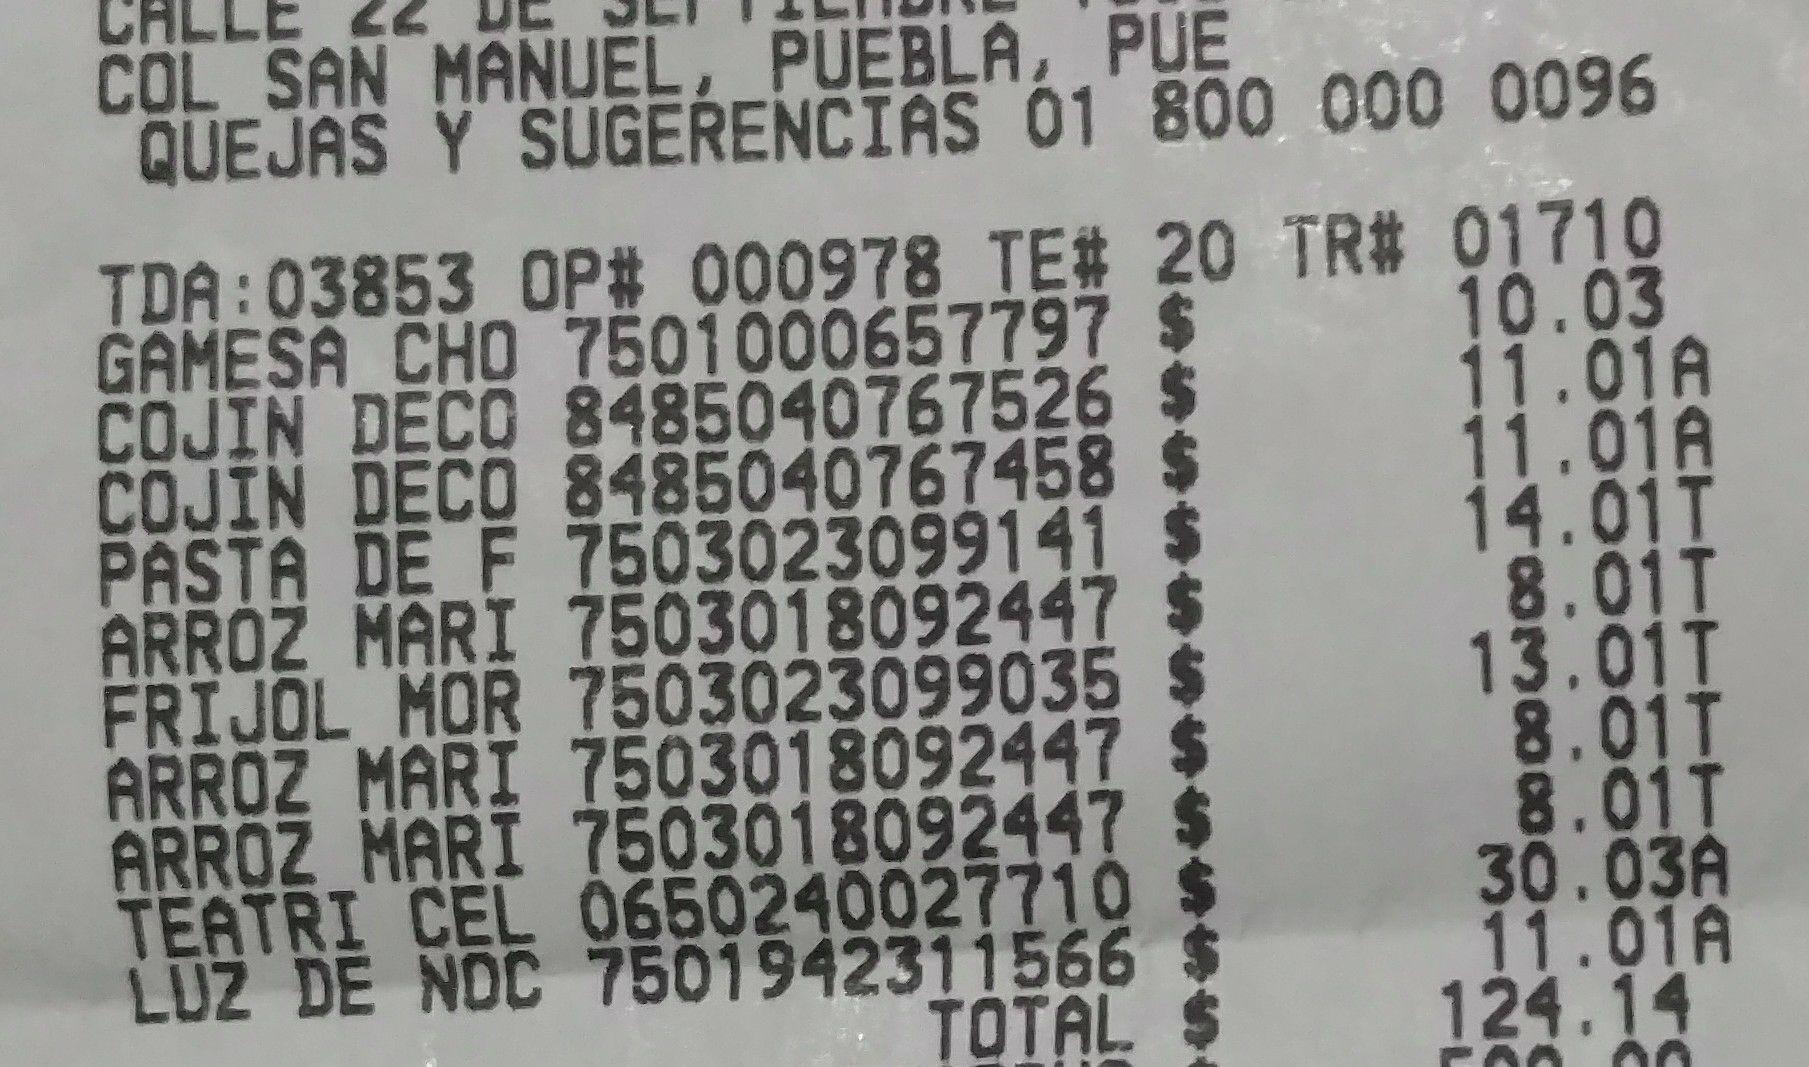 Walmart San Manuel: Arroz Morimoto $8.01 cojín $11.01 lámpara pony $11.01